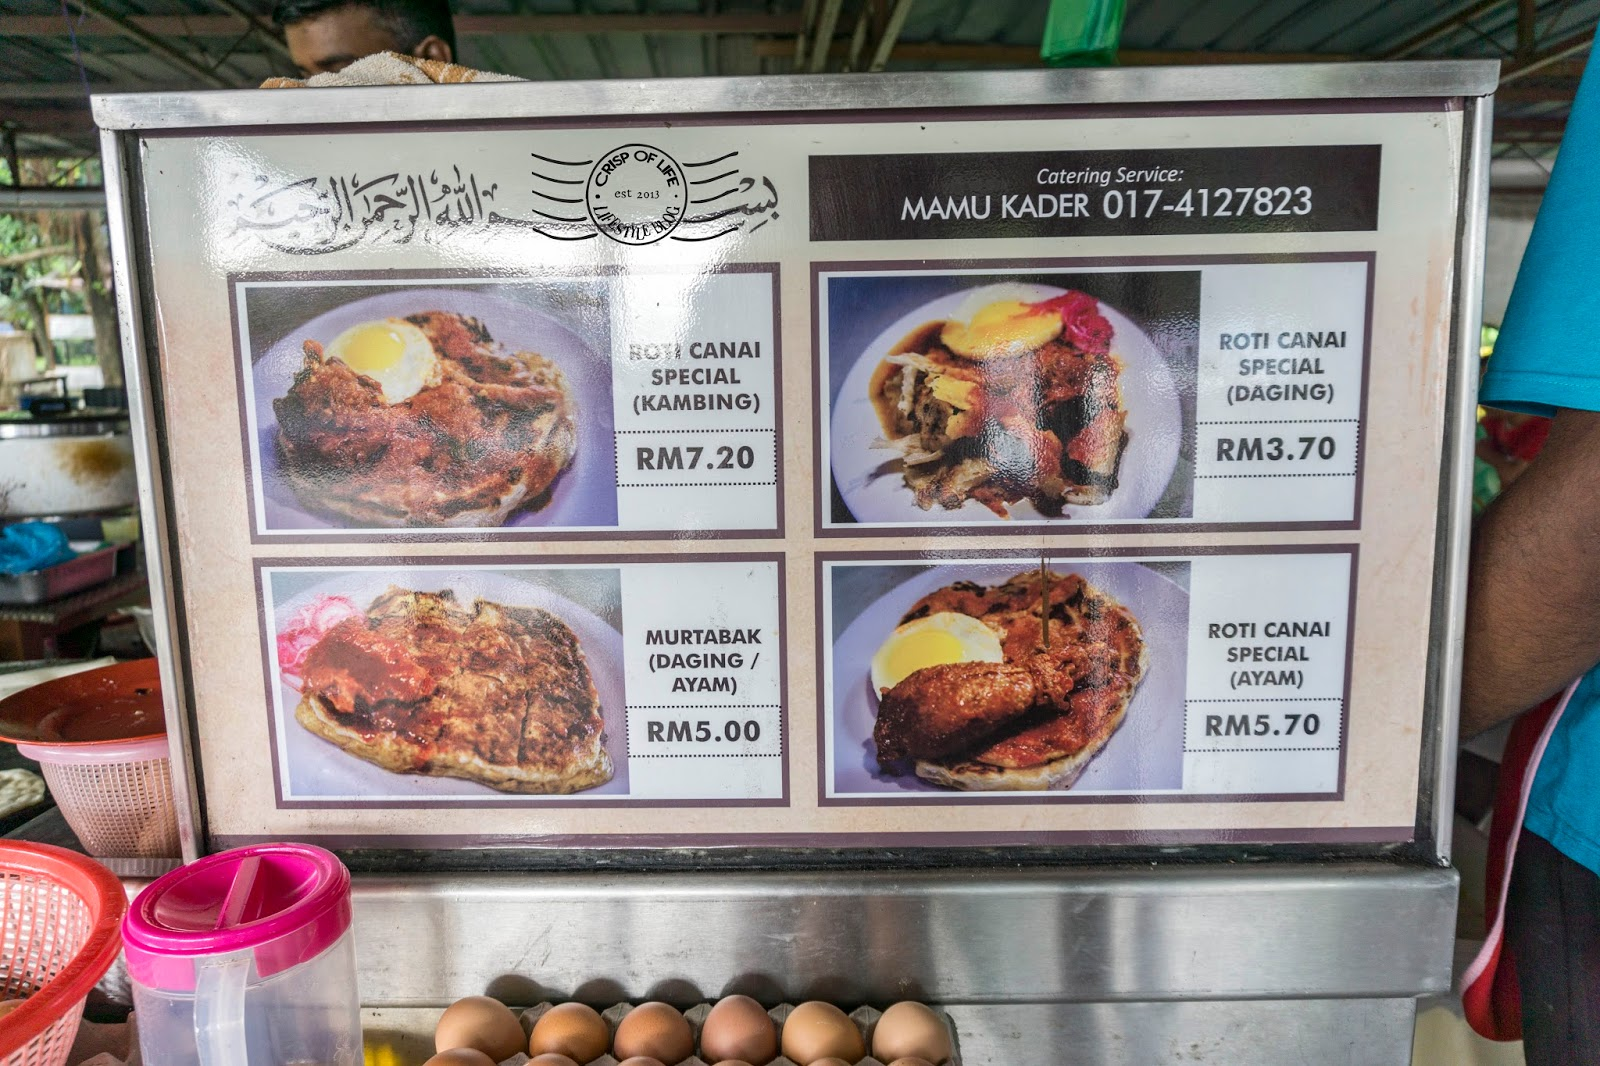 Sungai Ara Roti Canai Malay Economy Rice